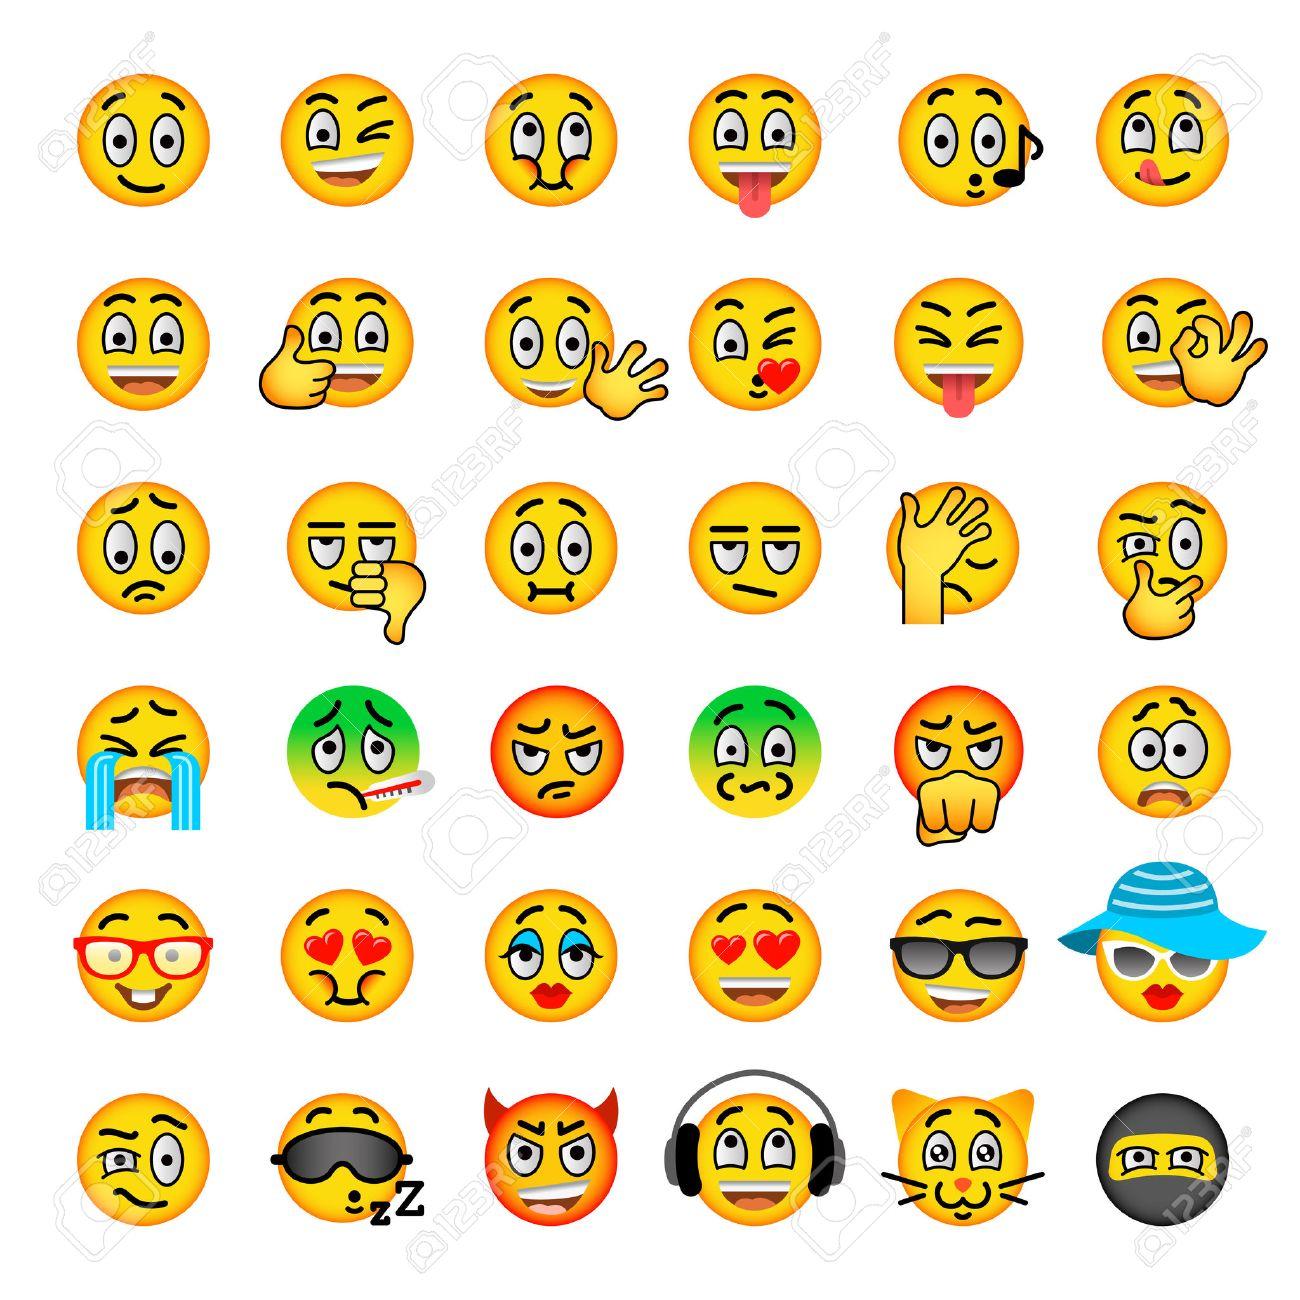 Texting smiley faces symbols